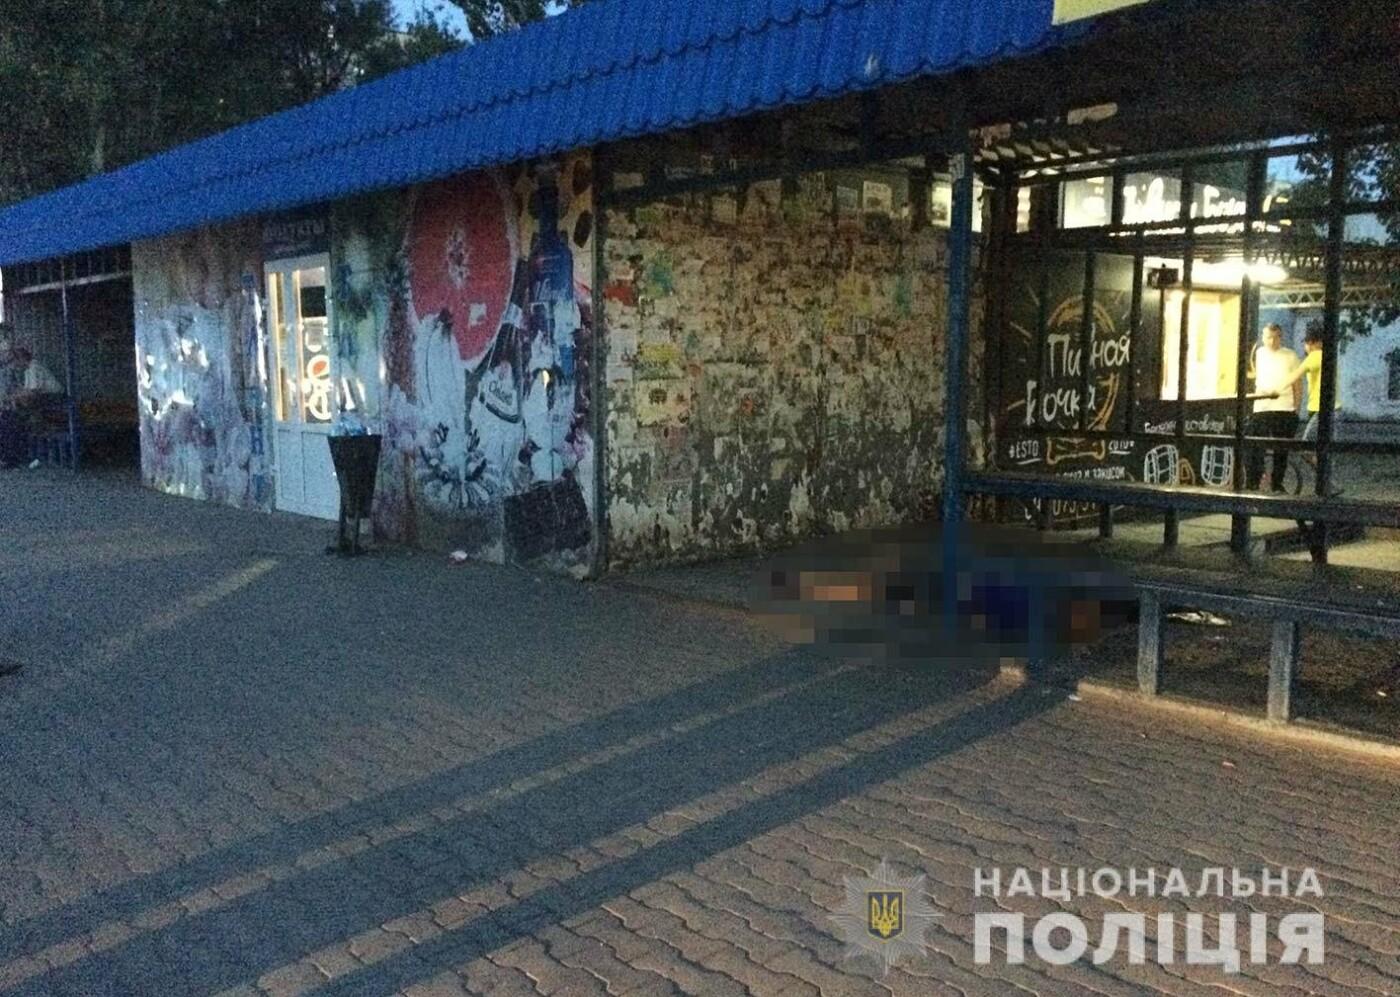 В Днепропетровской области мужчина подозревается в убийстве коллеги, - ФОТО, фото-1